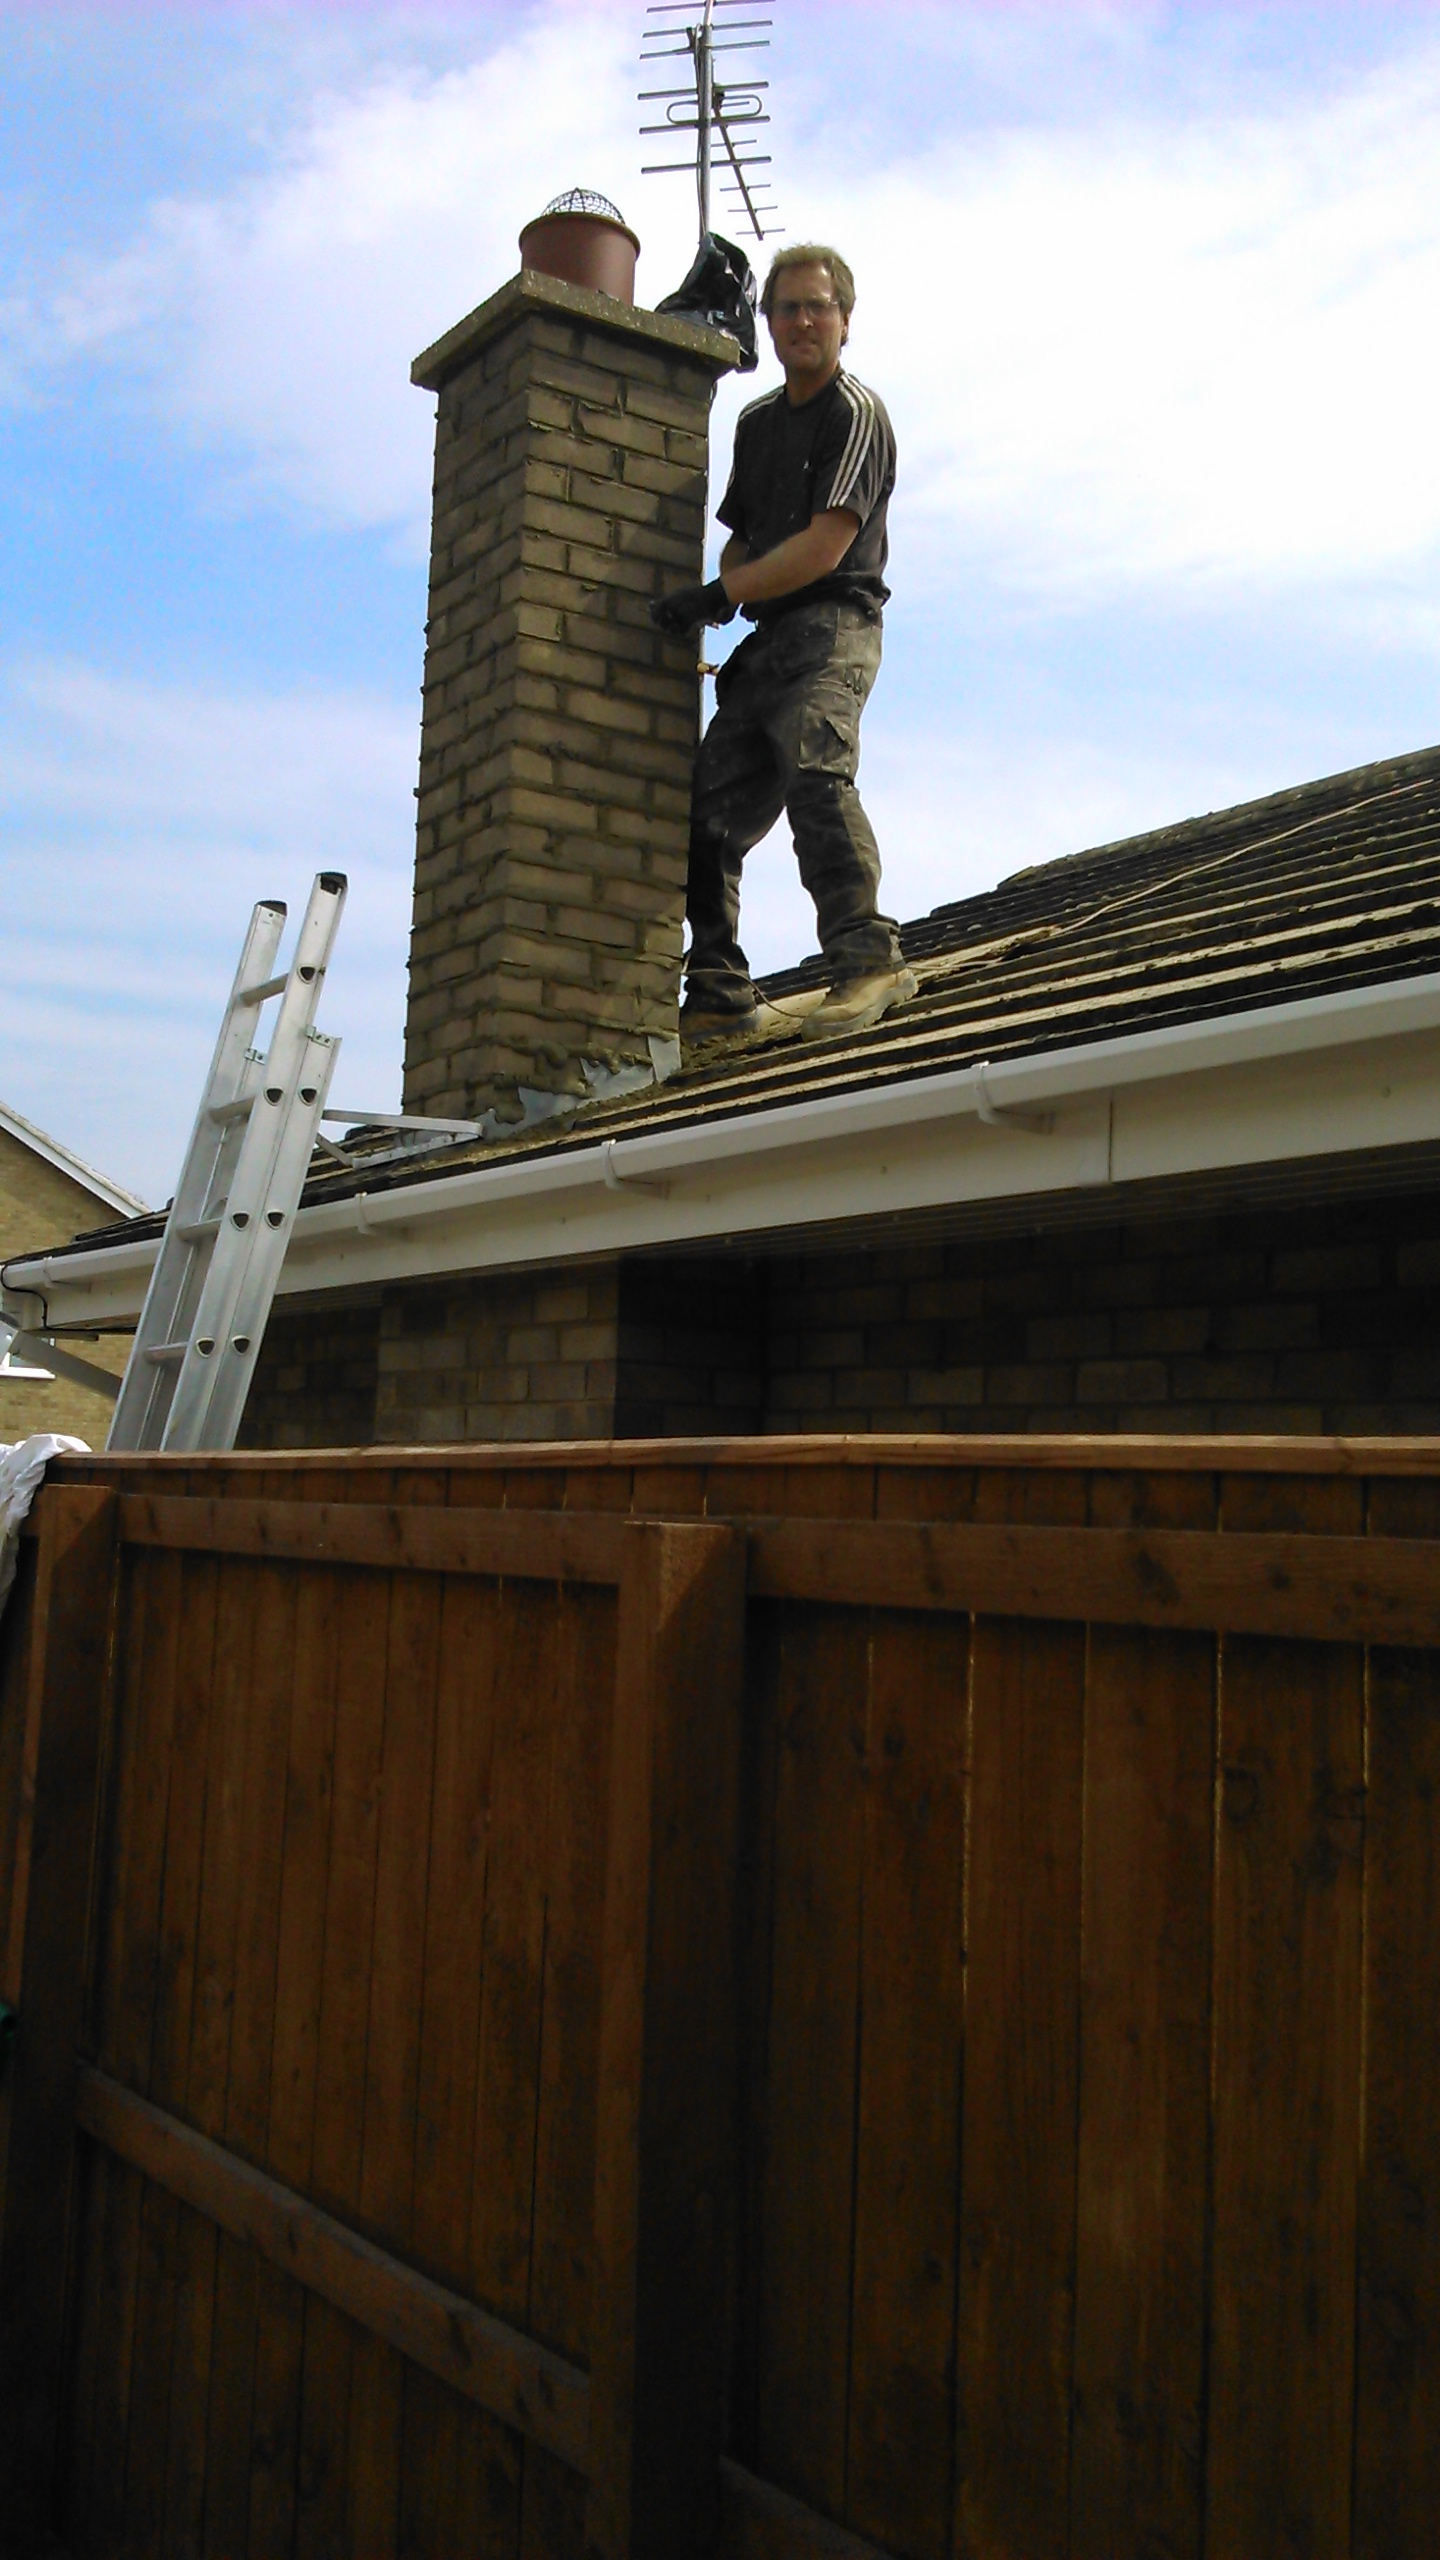 Repointing A Chimney : Repointing a chimney ashtons handyman property services